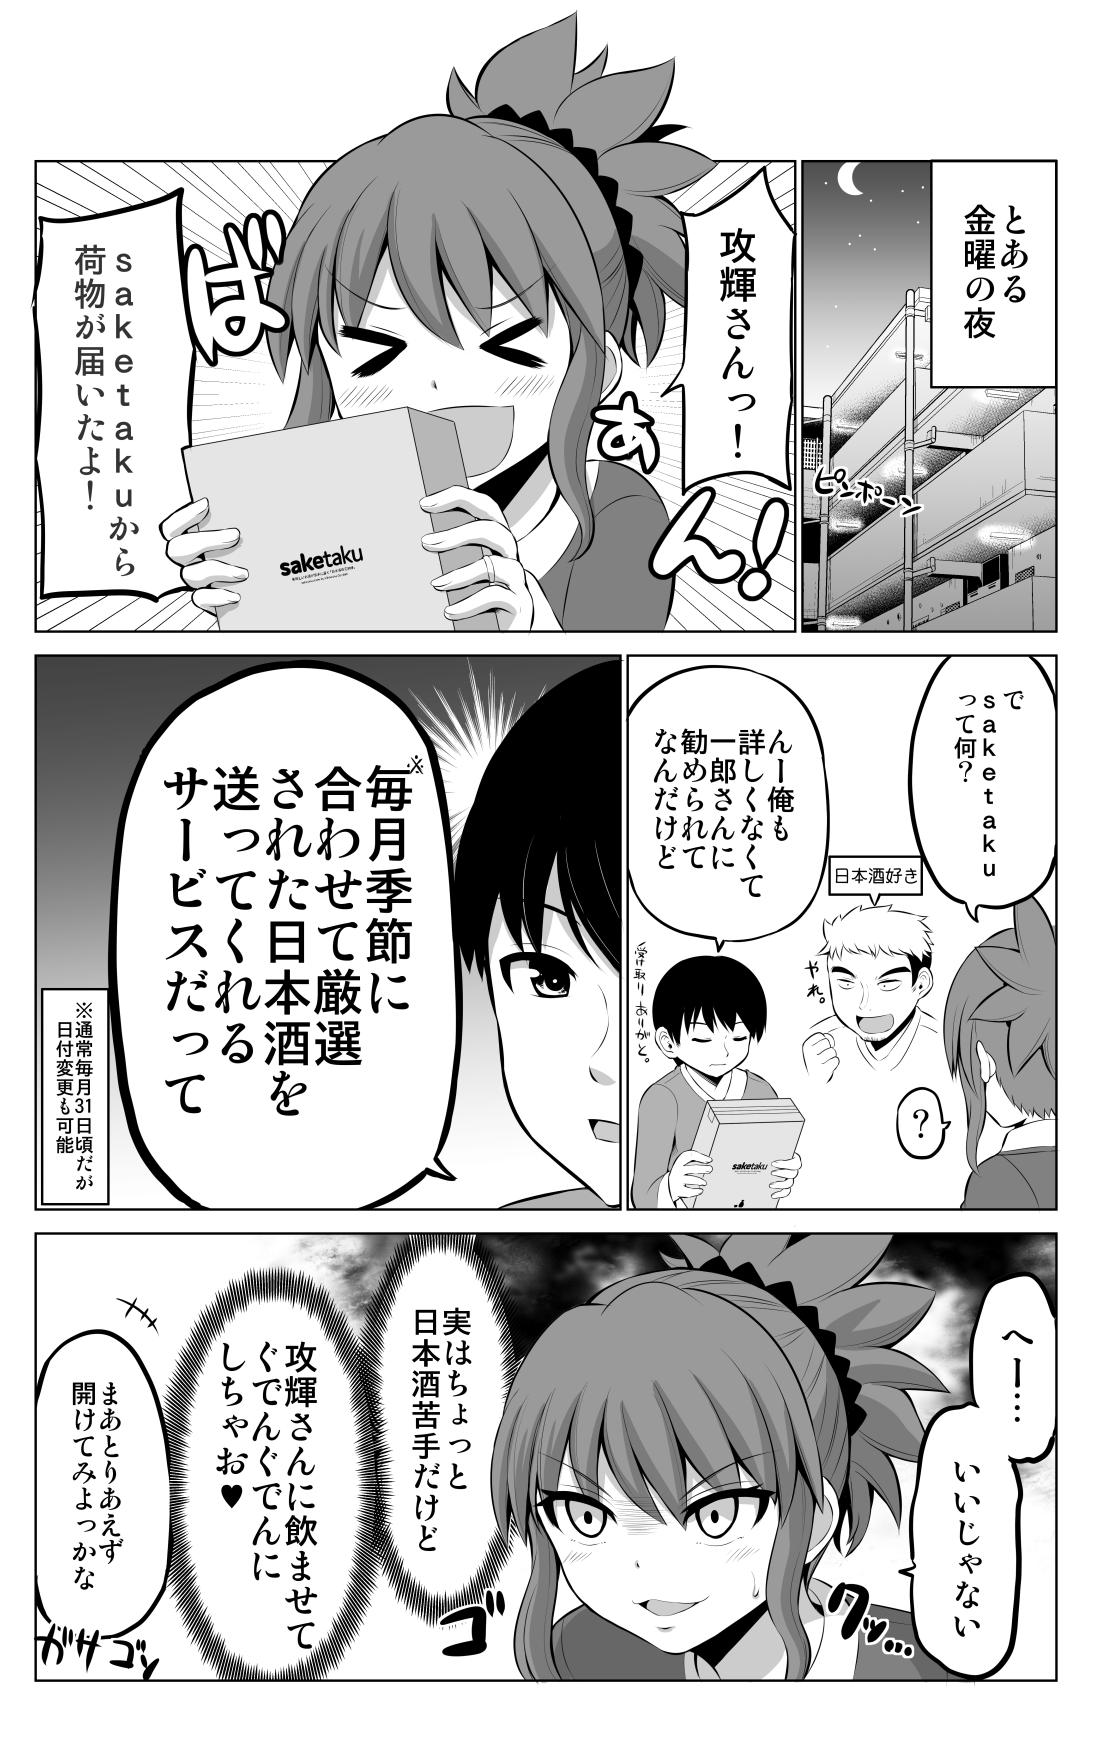 【第37話】防御力ゼロの嫁 saketaku特別編